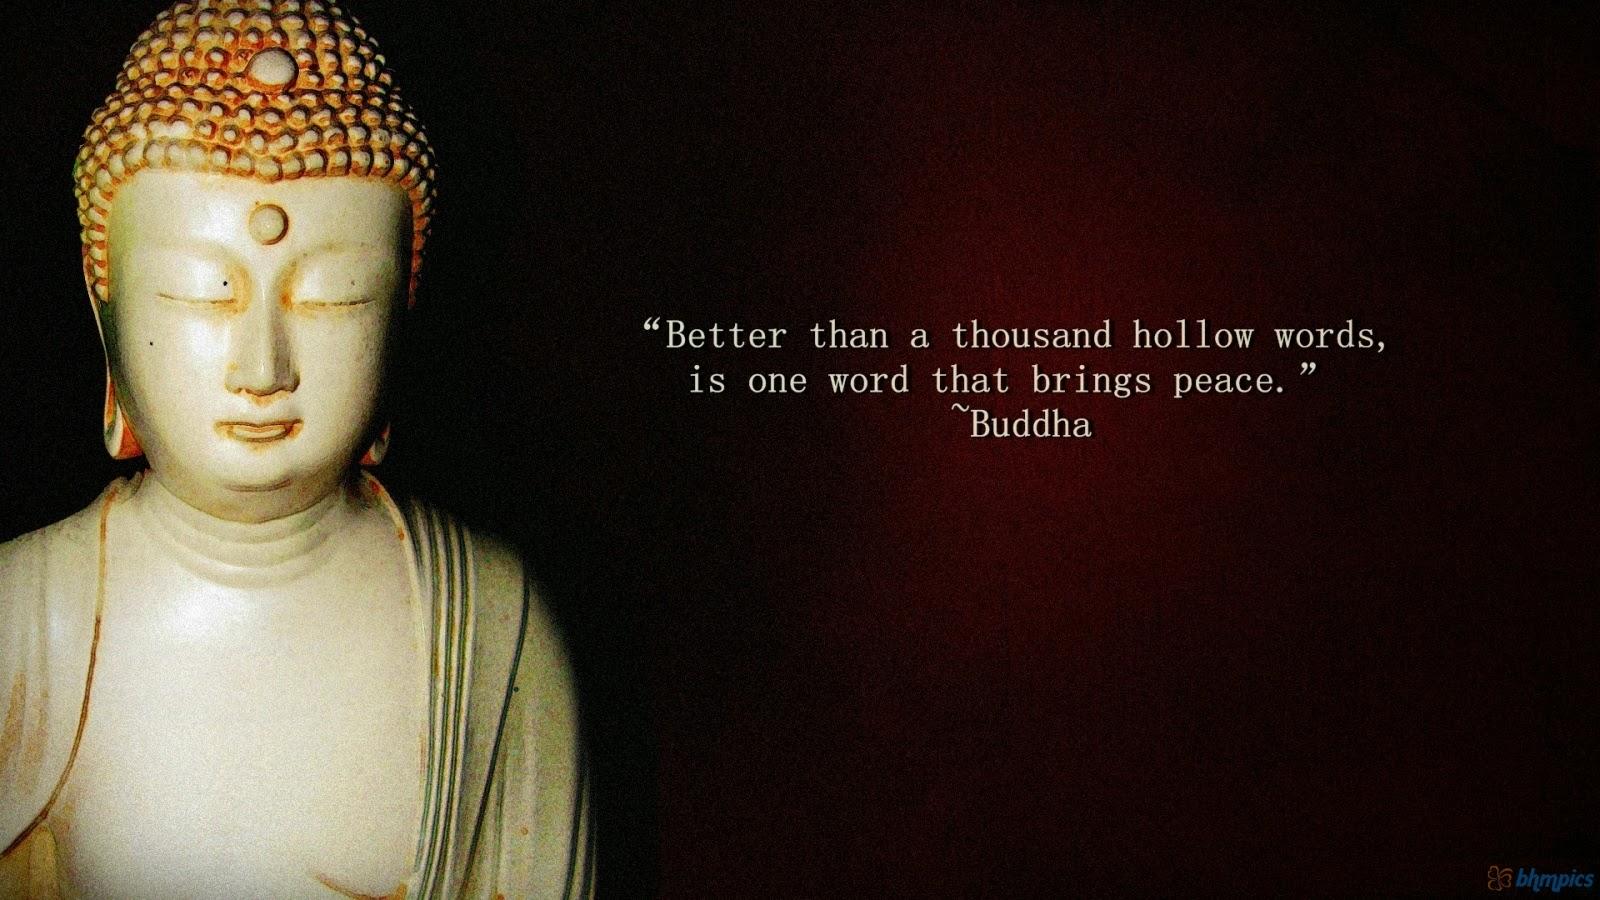 Buddha Quotes: Misplaced Snow Owl's Simple Life: The Wisdom Of Buddha